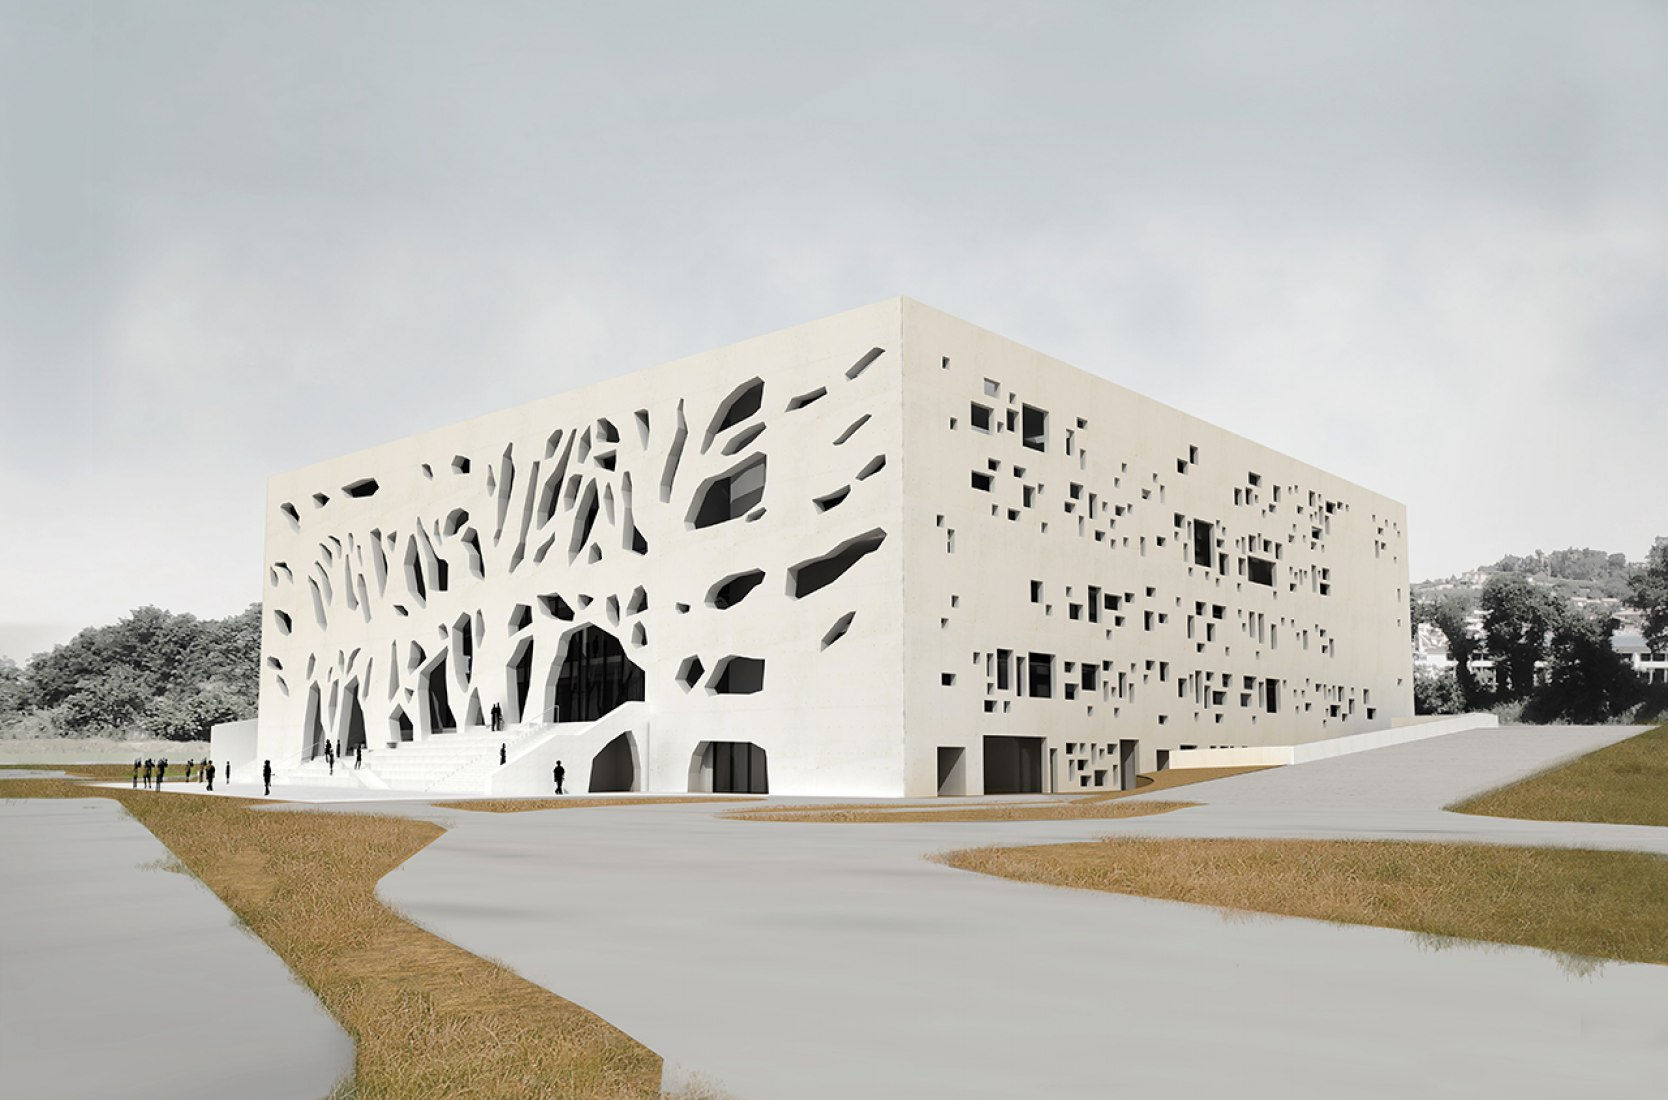 Fachada sureste. ANIMA por Bernard Tschumi. Imagen © Bernard Tschumi Architects.